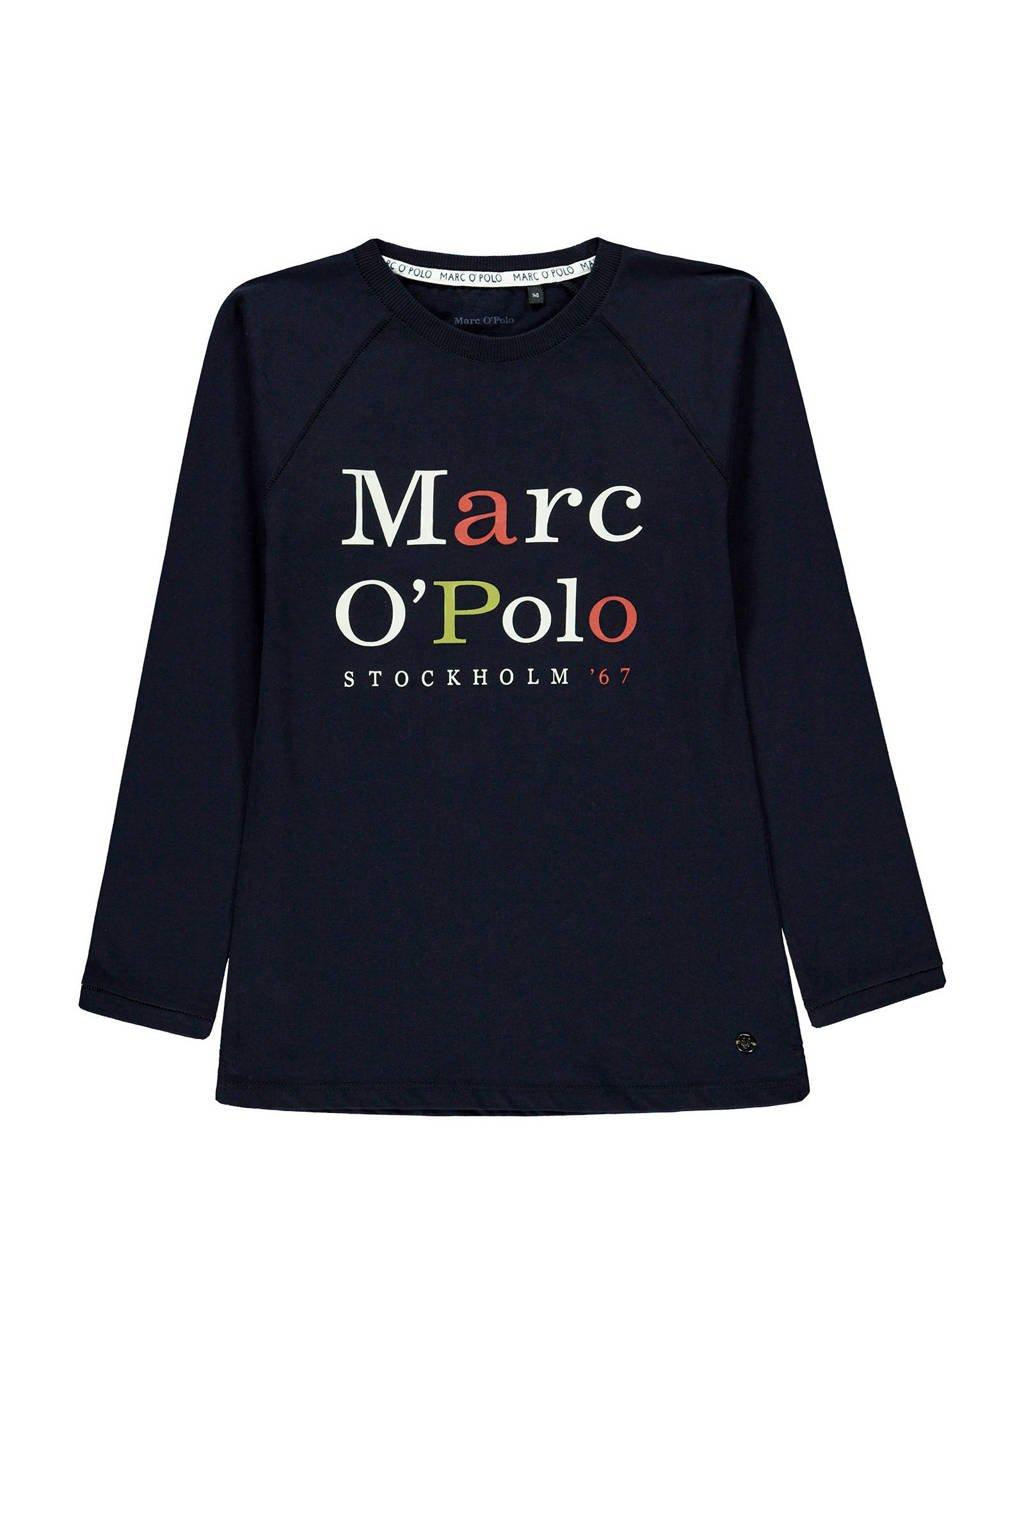 Marc O'Polo longsleeve met tekst donkerblauw/wit/rood, Donkerblauw/wit/rood